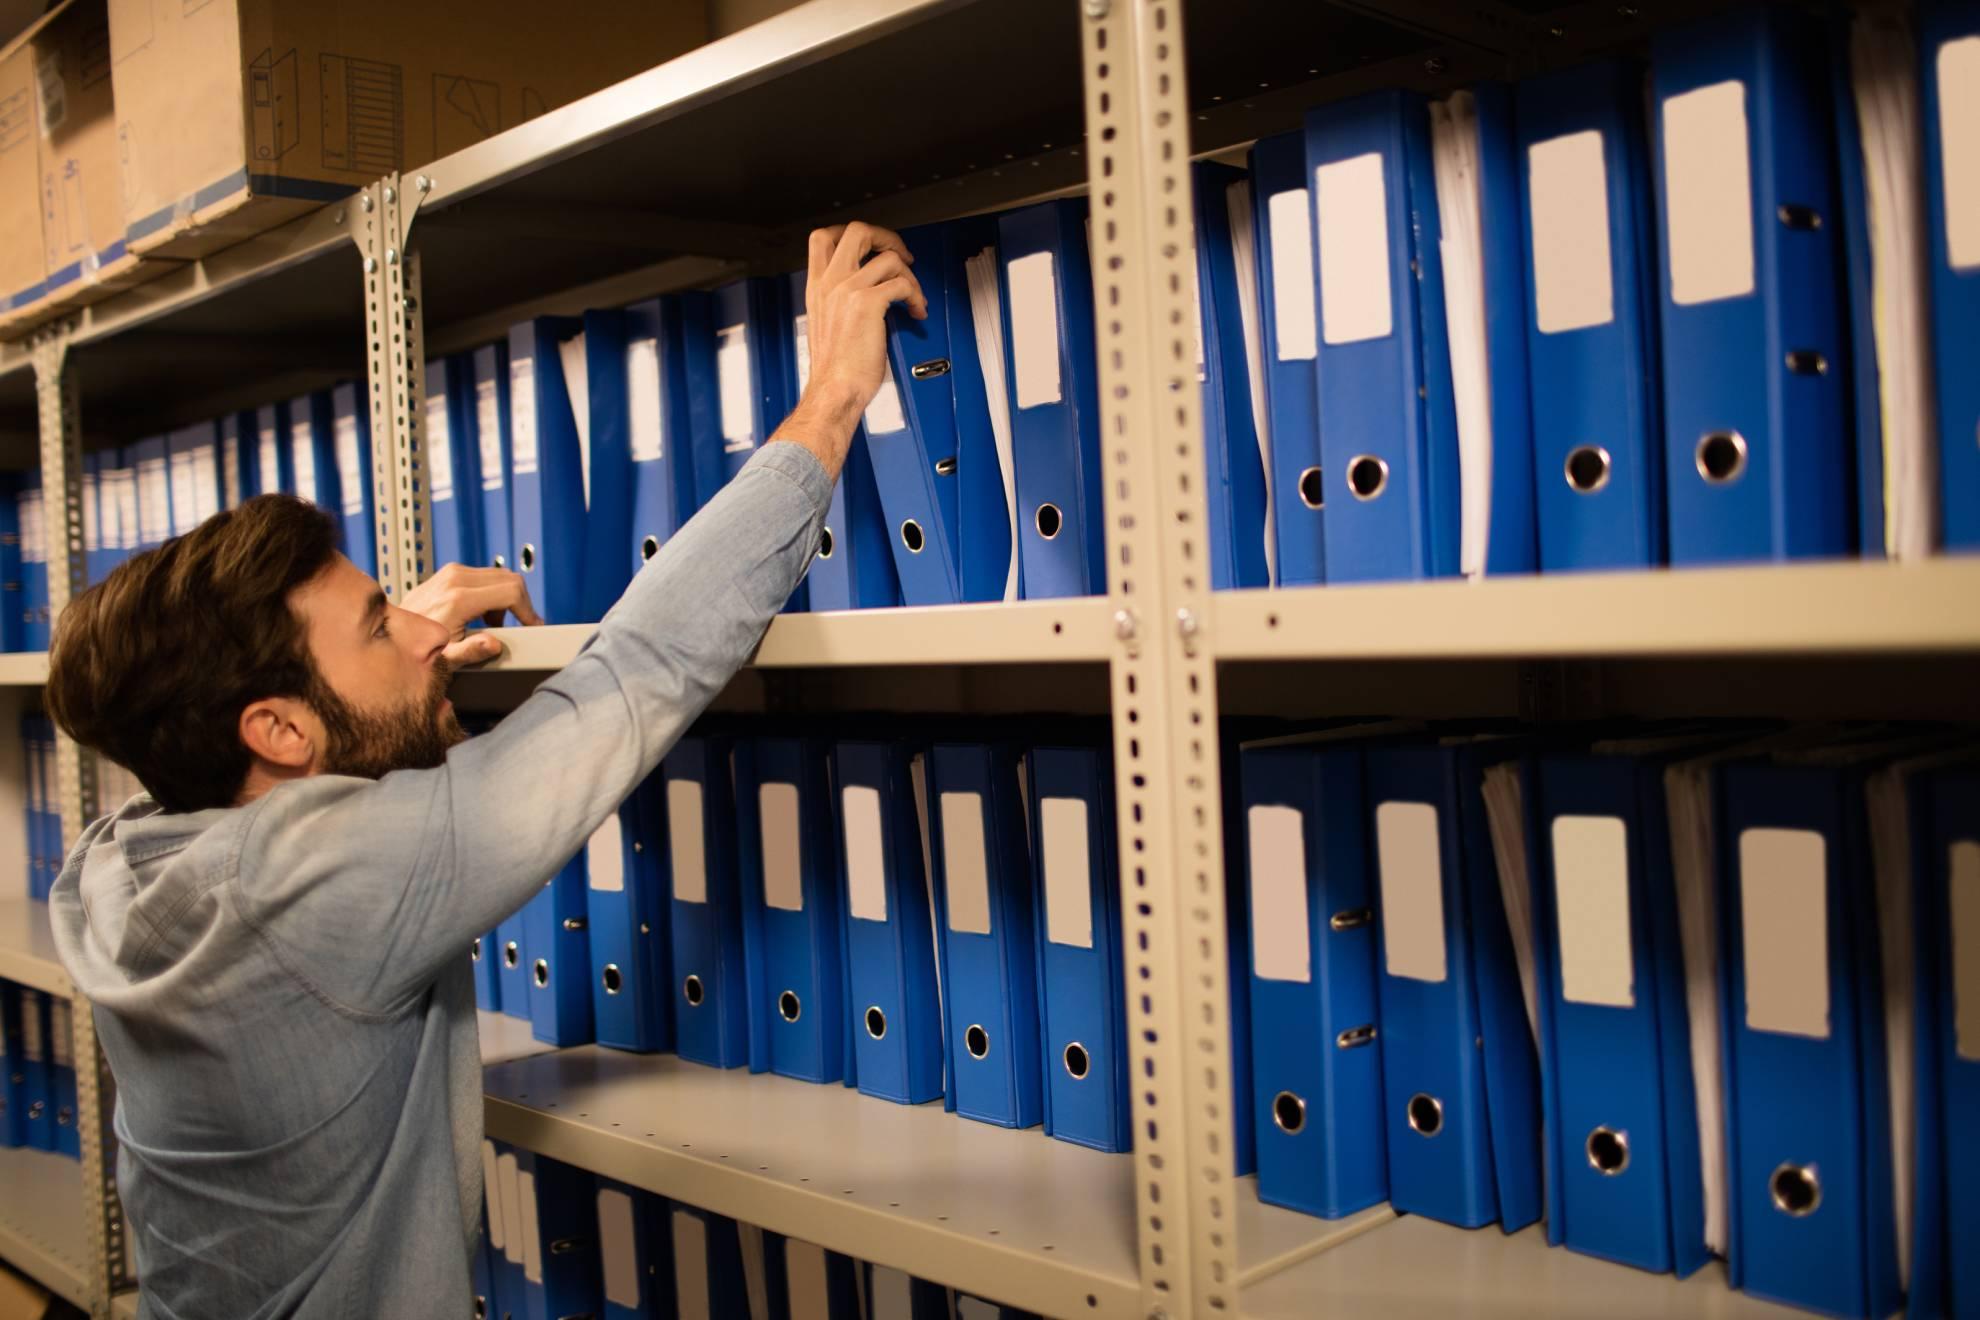 businessman-taking-file-from-shelf-in-storage-room-6RYKWWV (1)